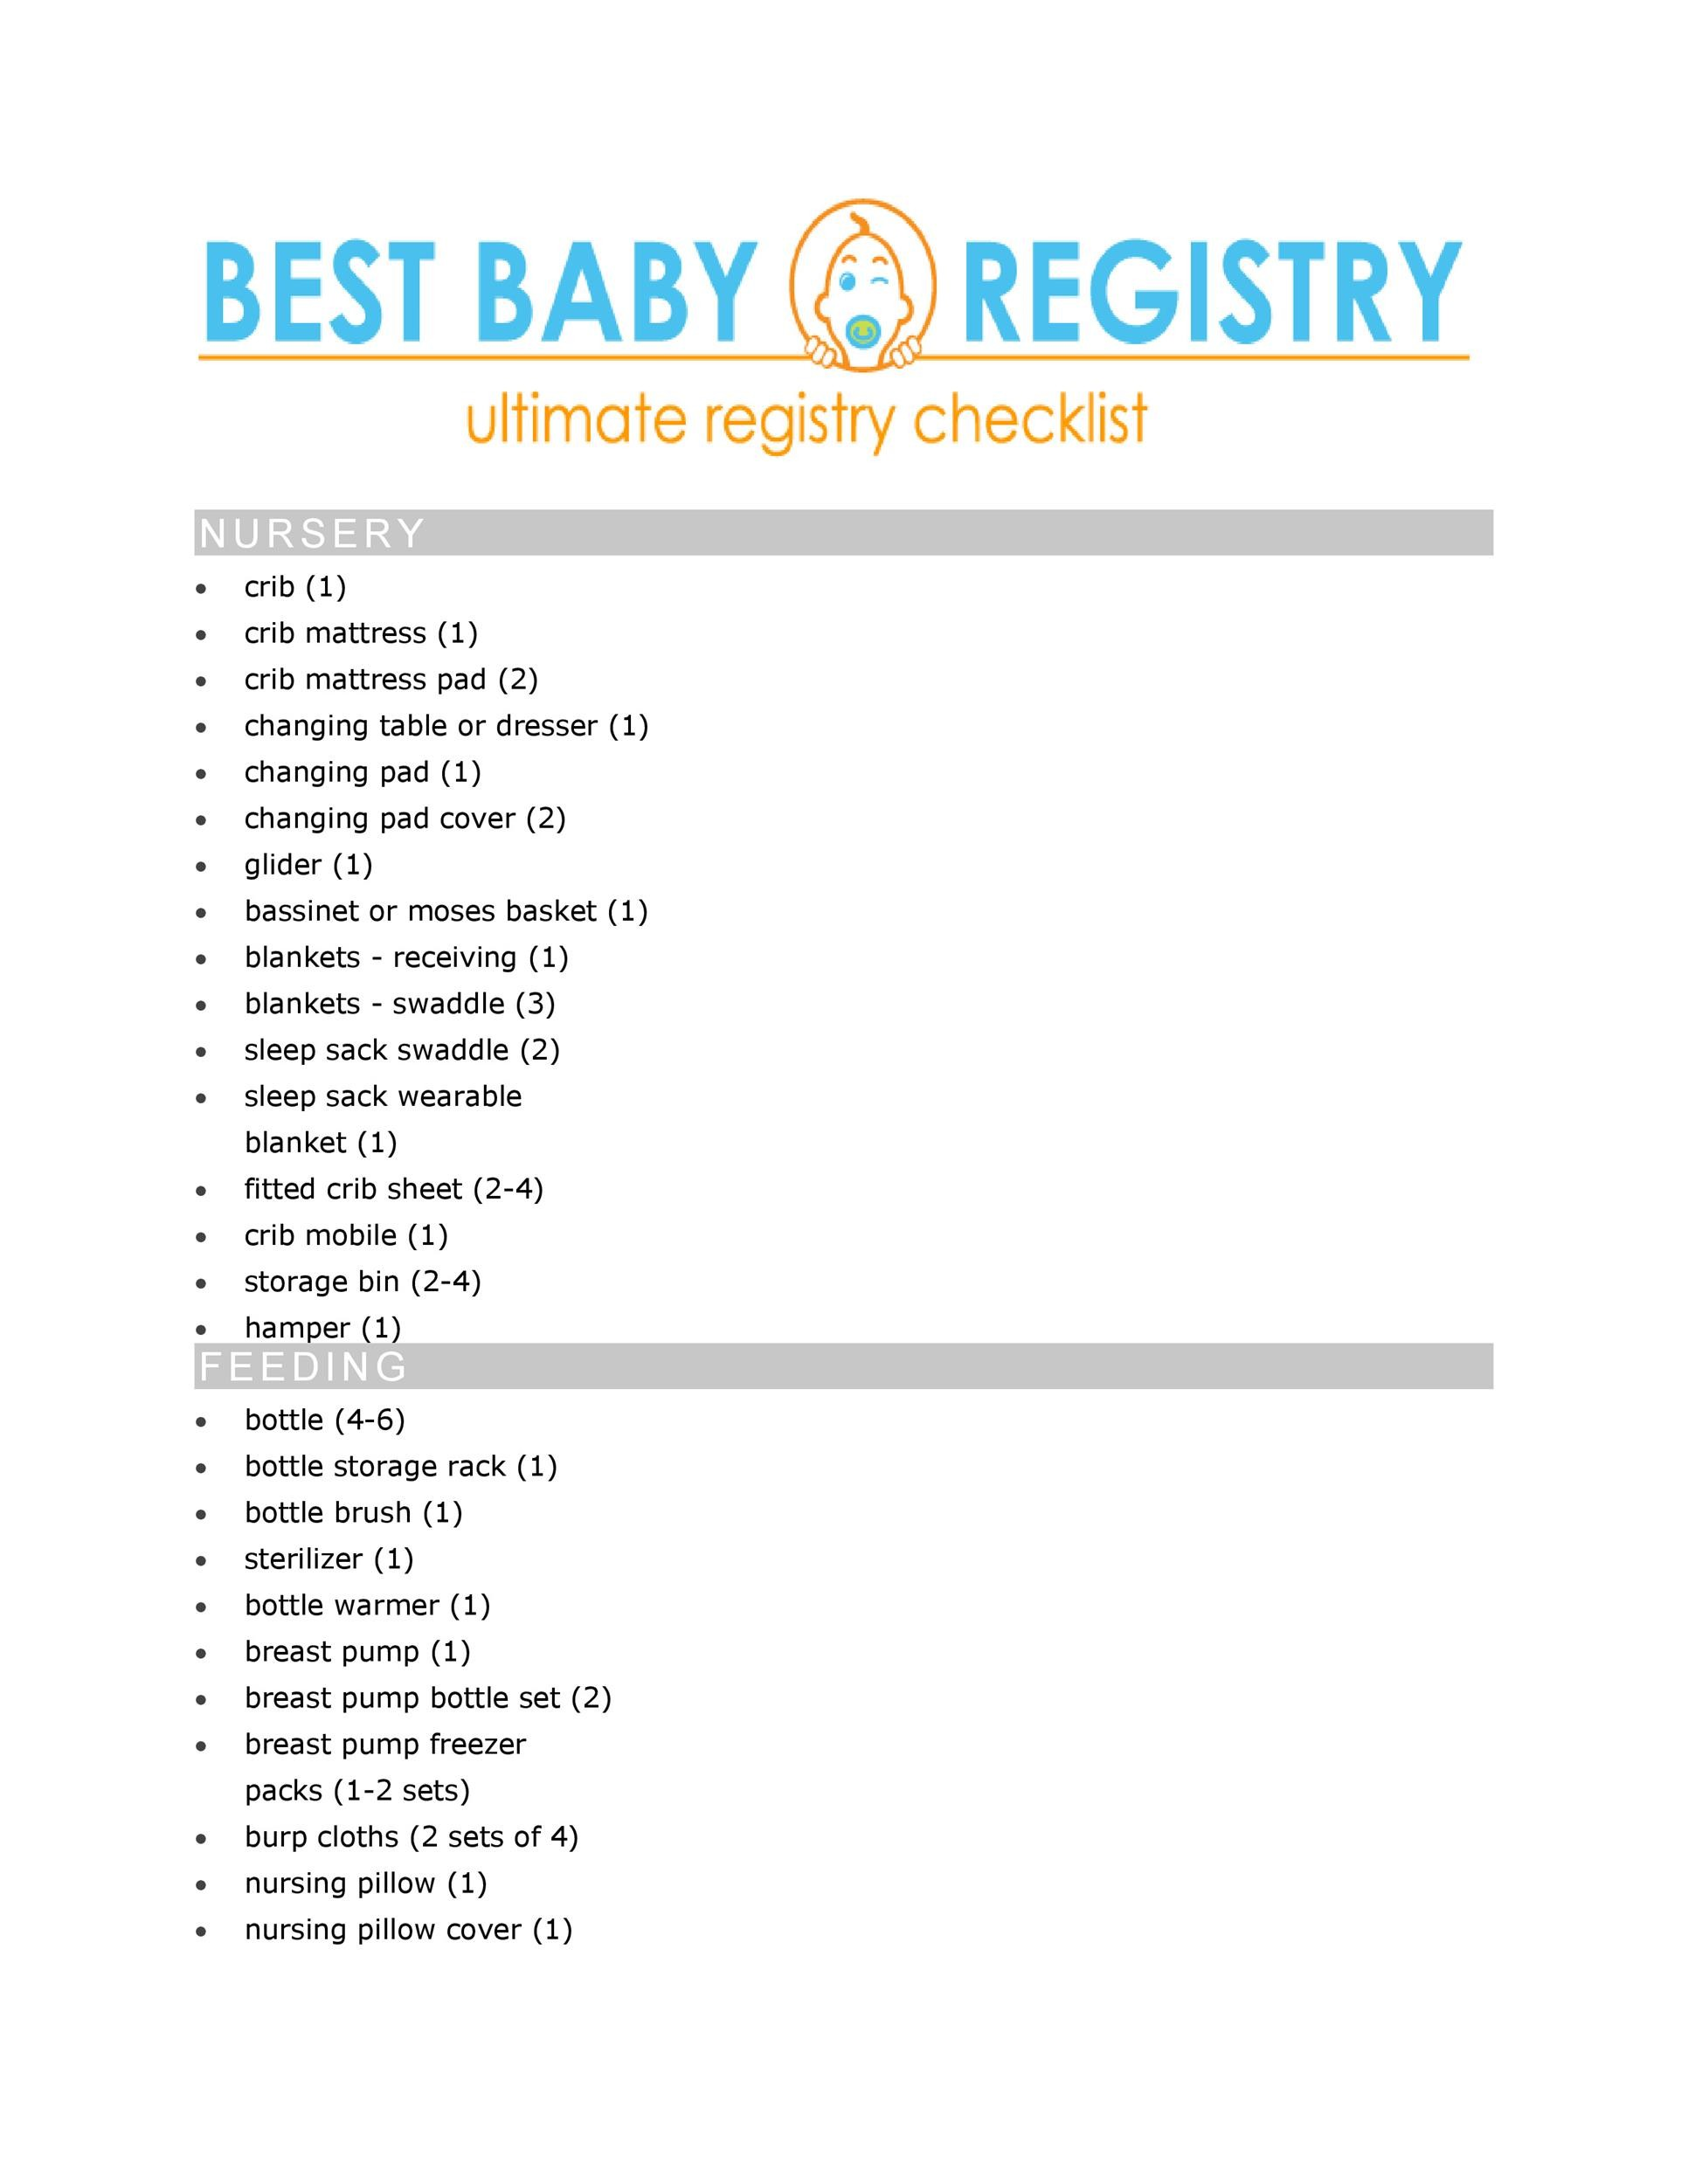 Free Baby Registry Checklist 03